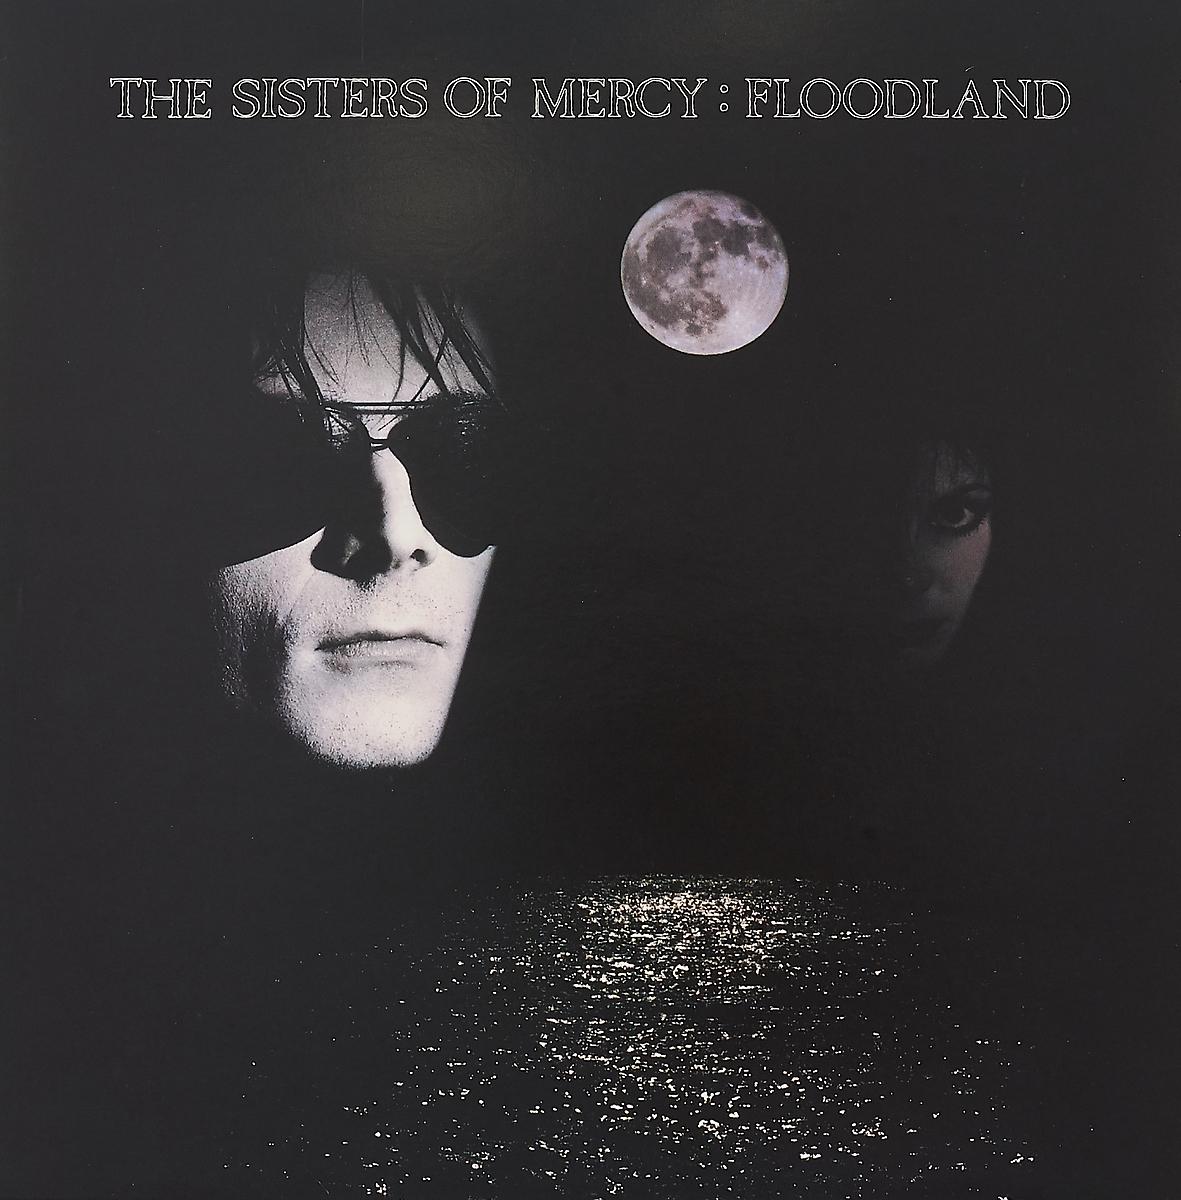 The Sisters Of Mercy The Sisters Of Mercy. Floodland (LP) the sisters of mercy sisters of mercy the triple album collection 3 cd